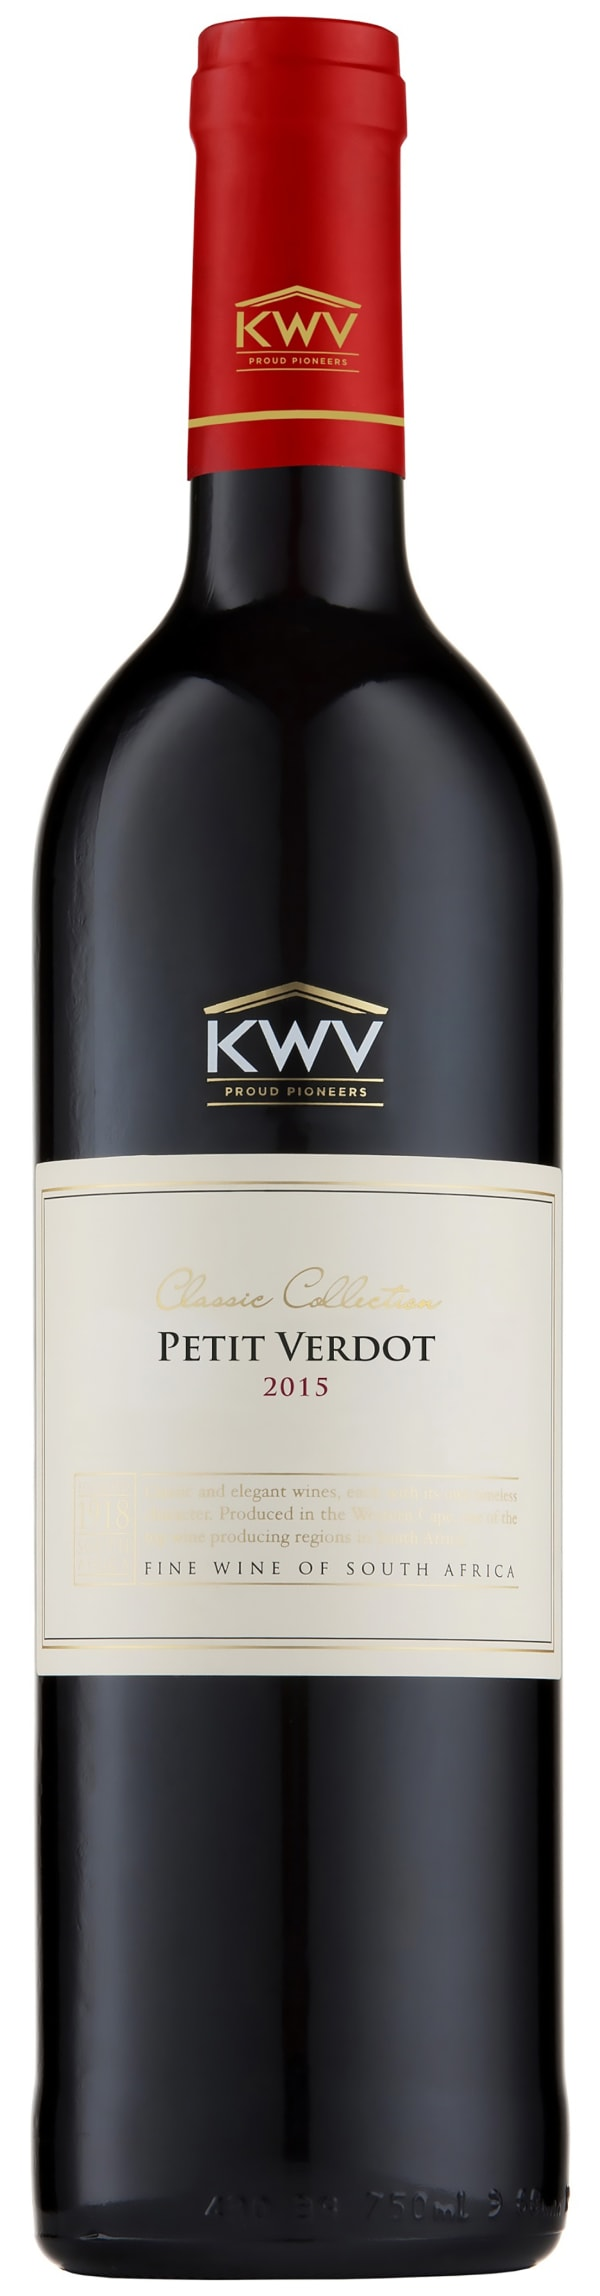 KWV Classic Collection Petit Verdot 2015